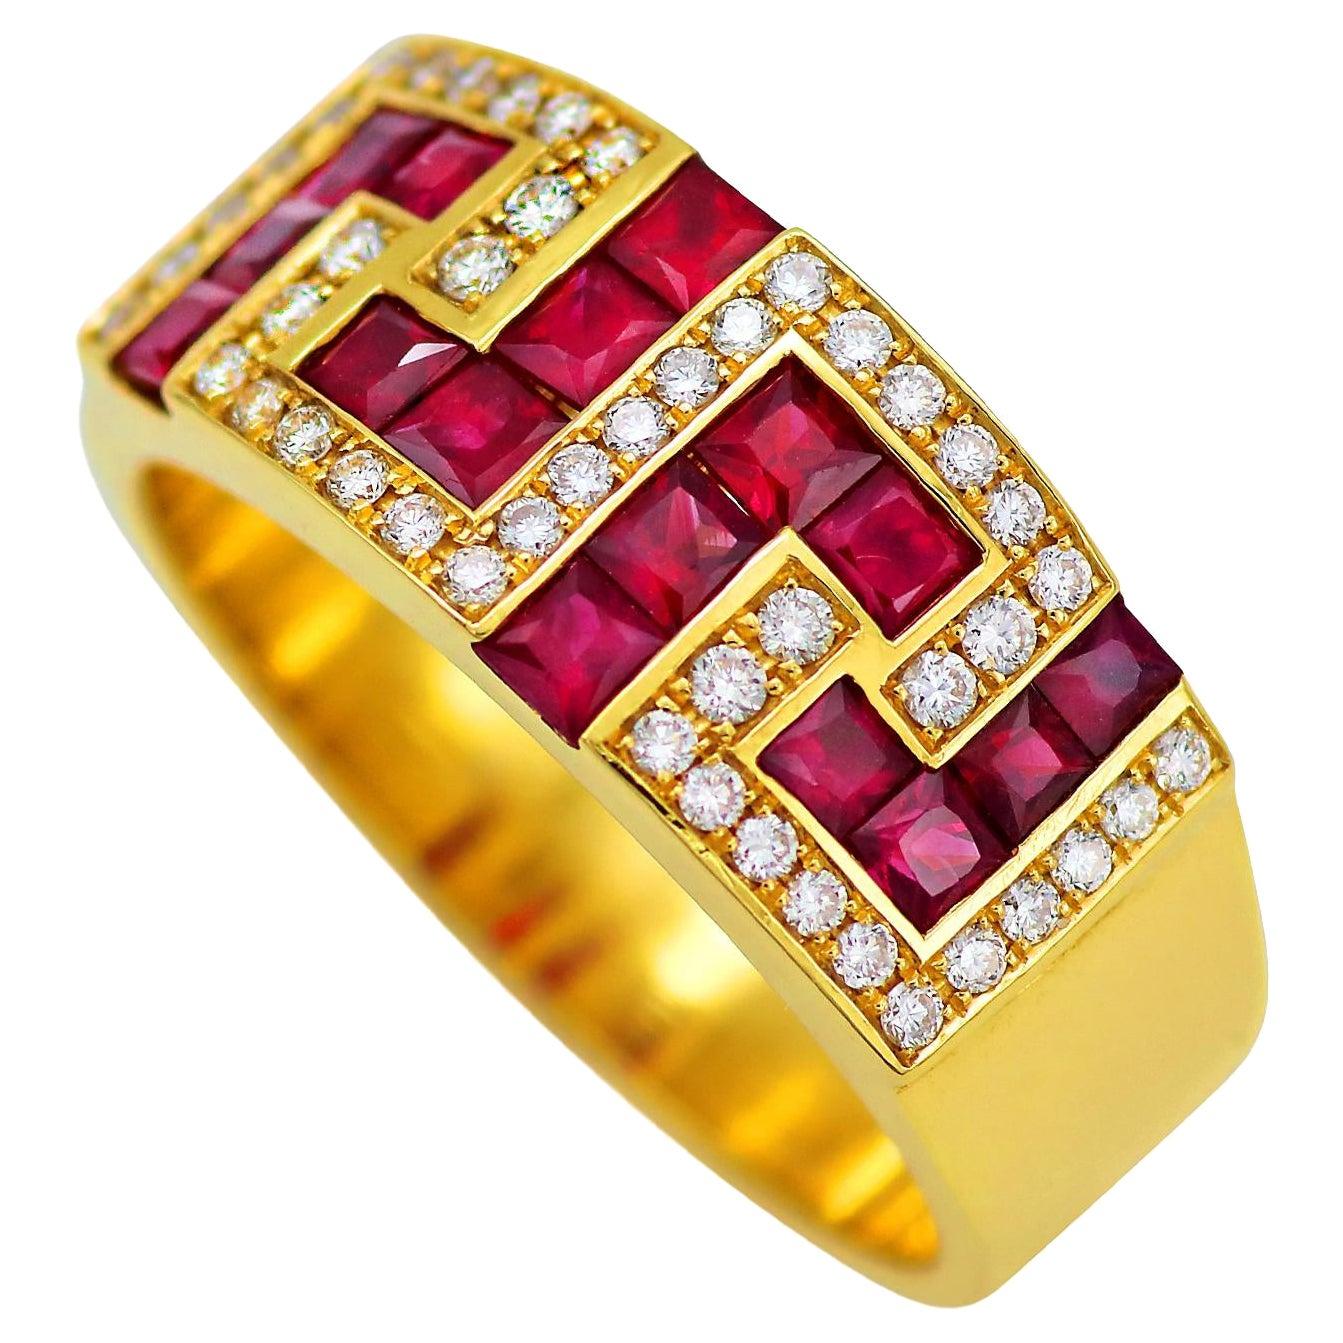 Dimos 18k Gold Greek Key Band Ring with Rubies